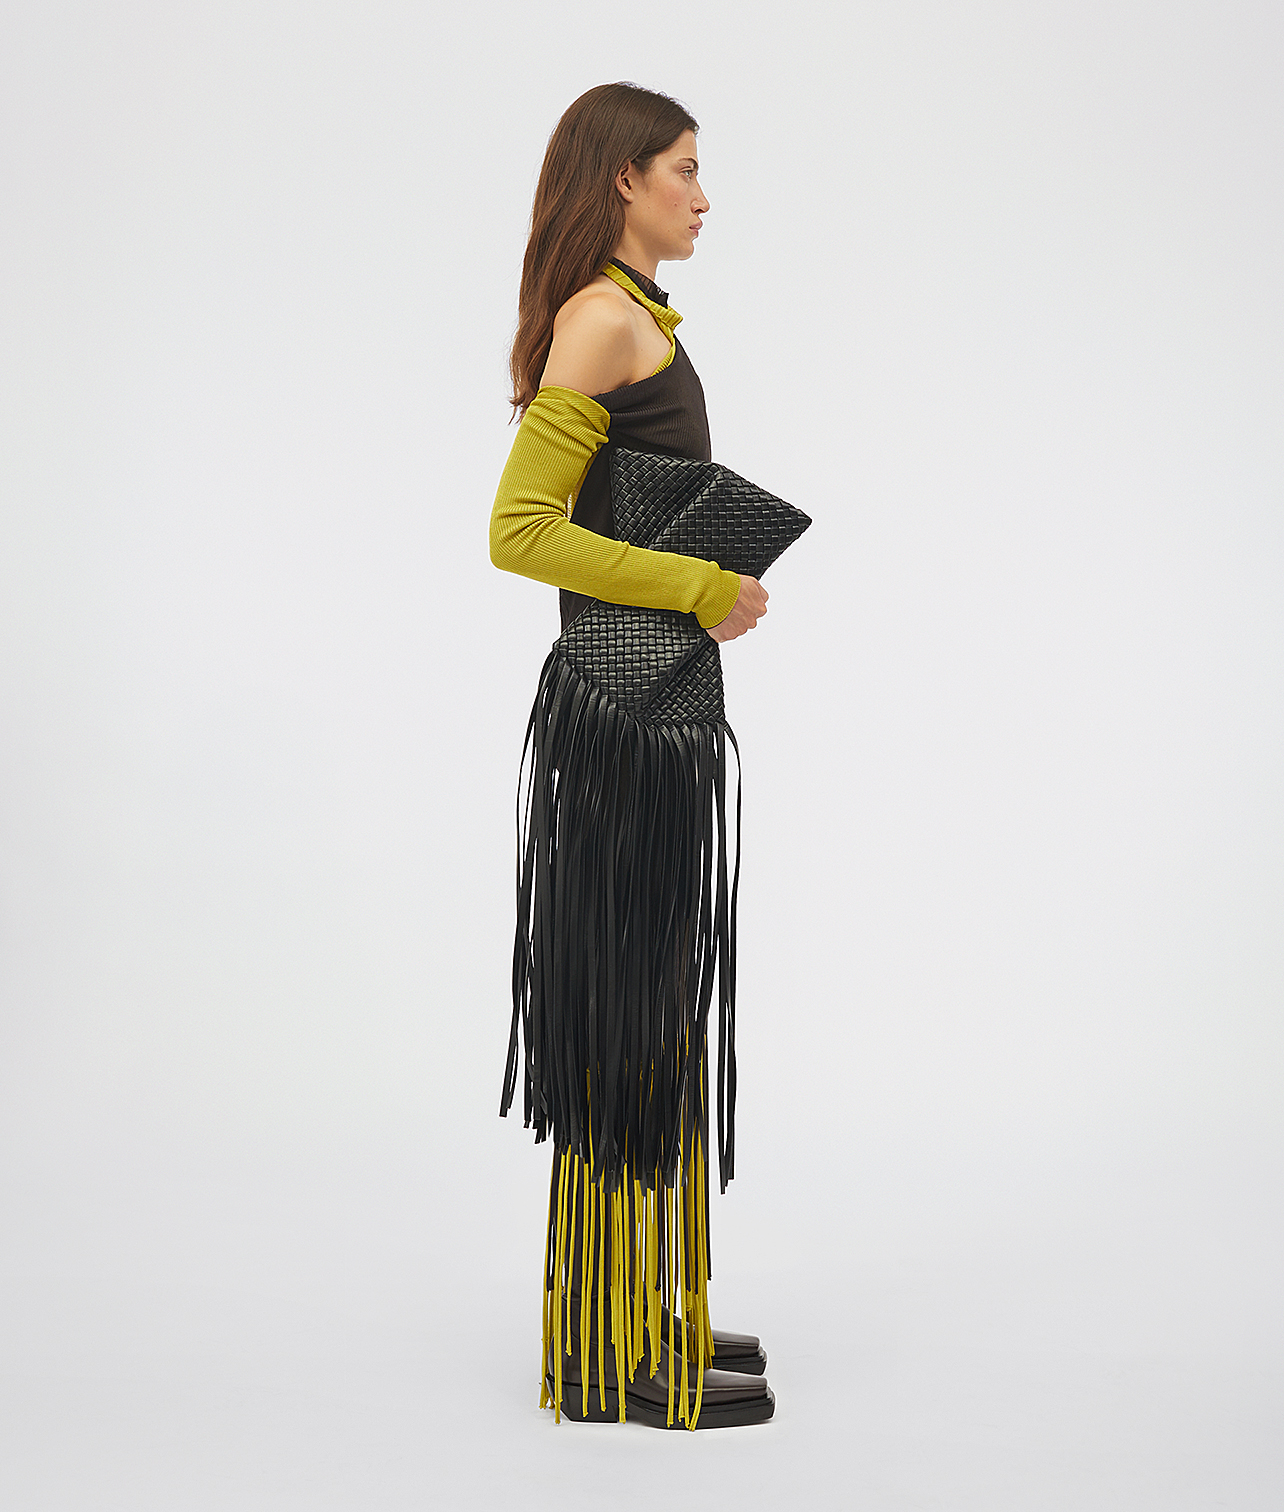 Платье, сумка Bottega Veneta